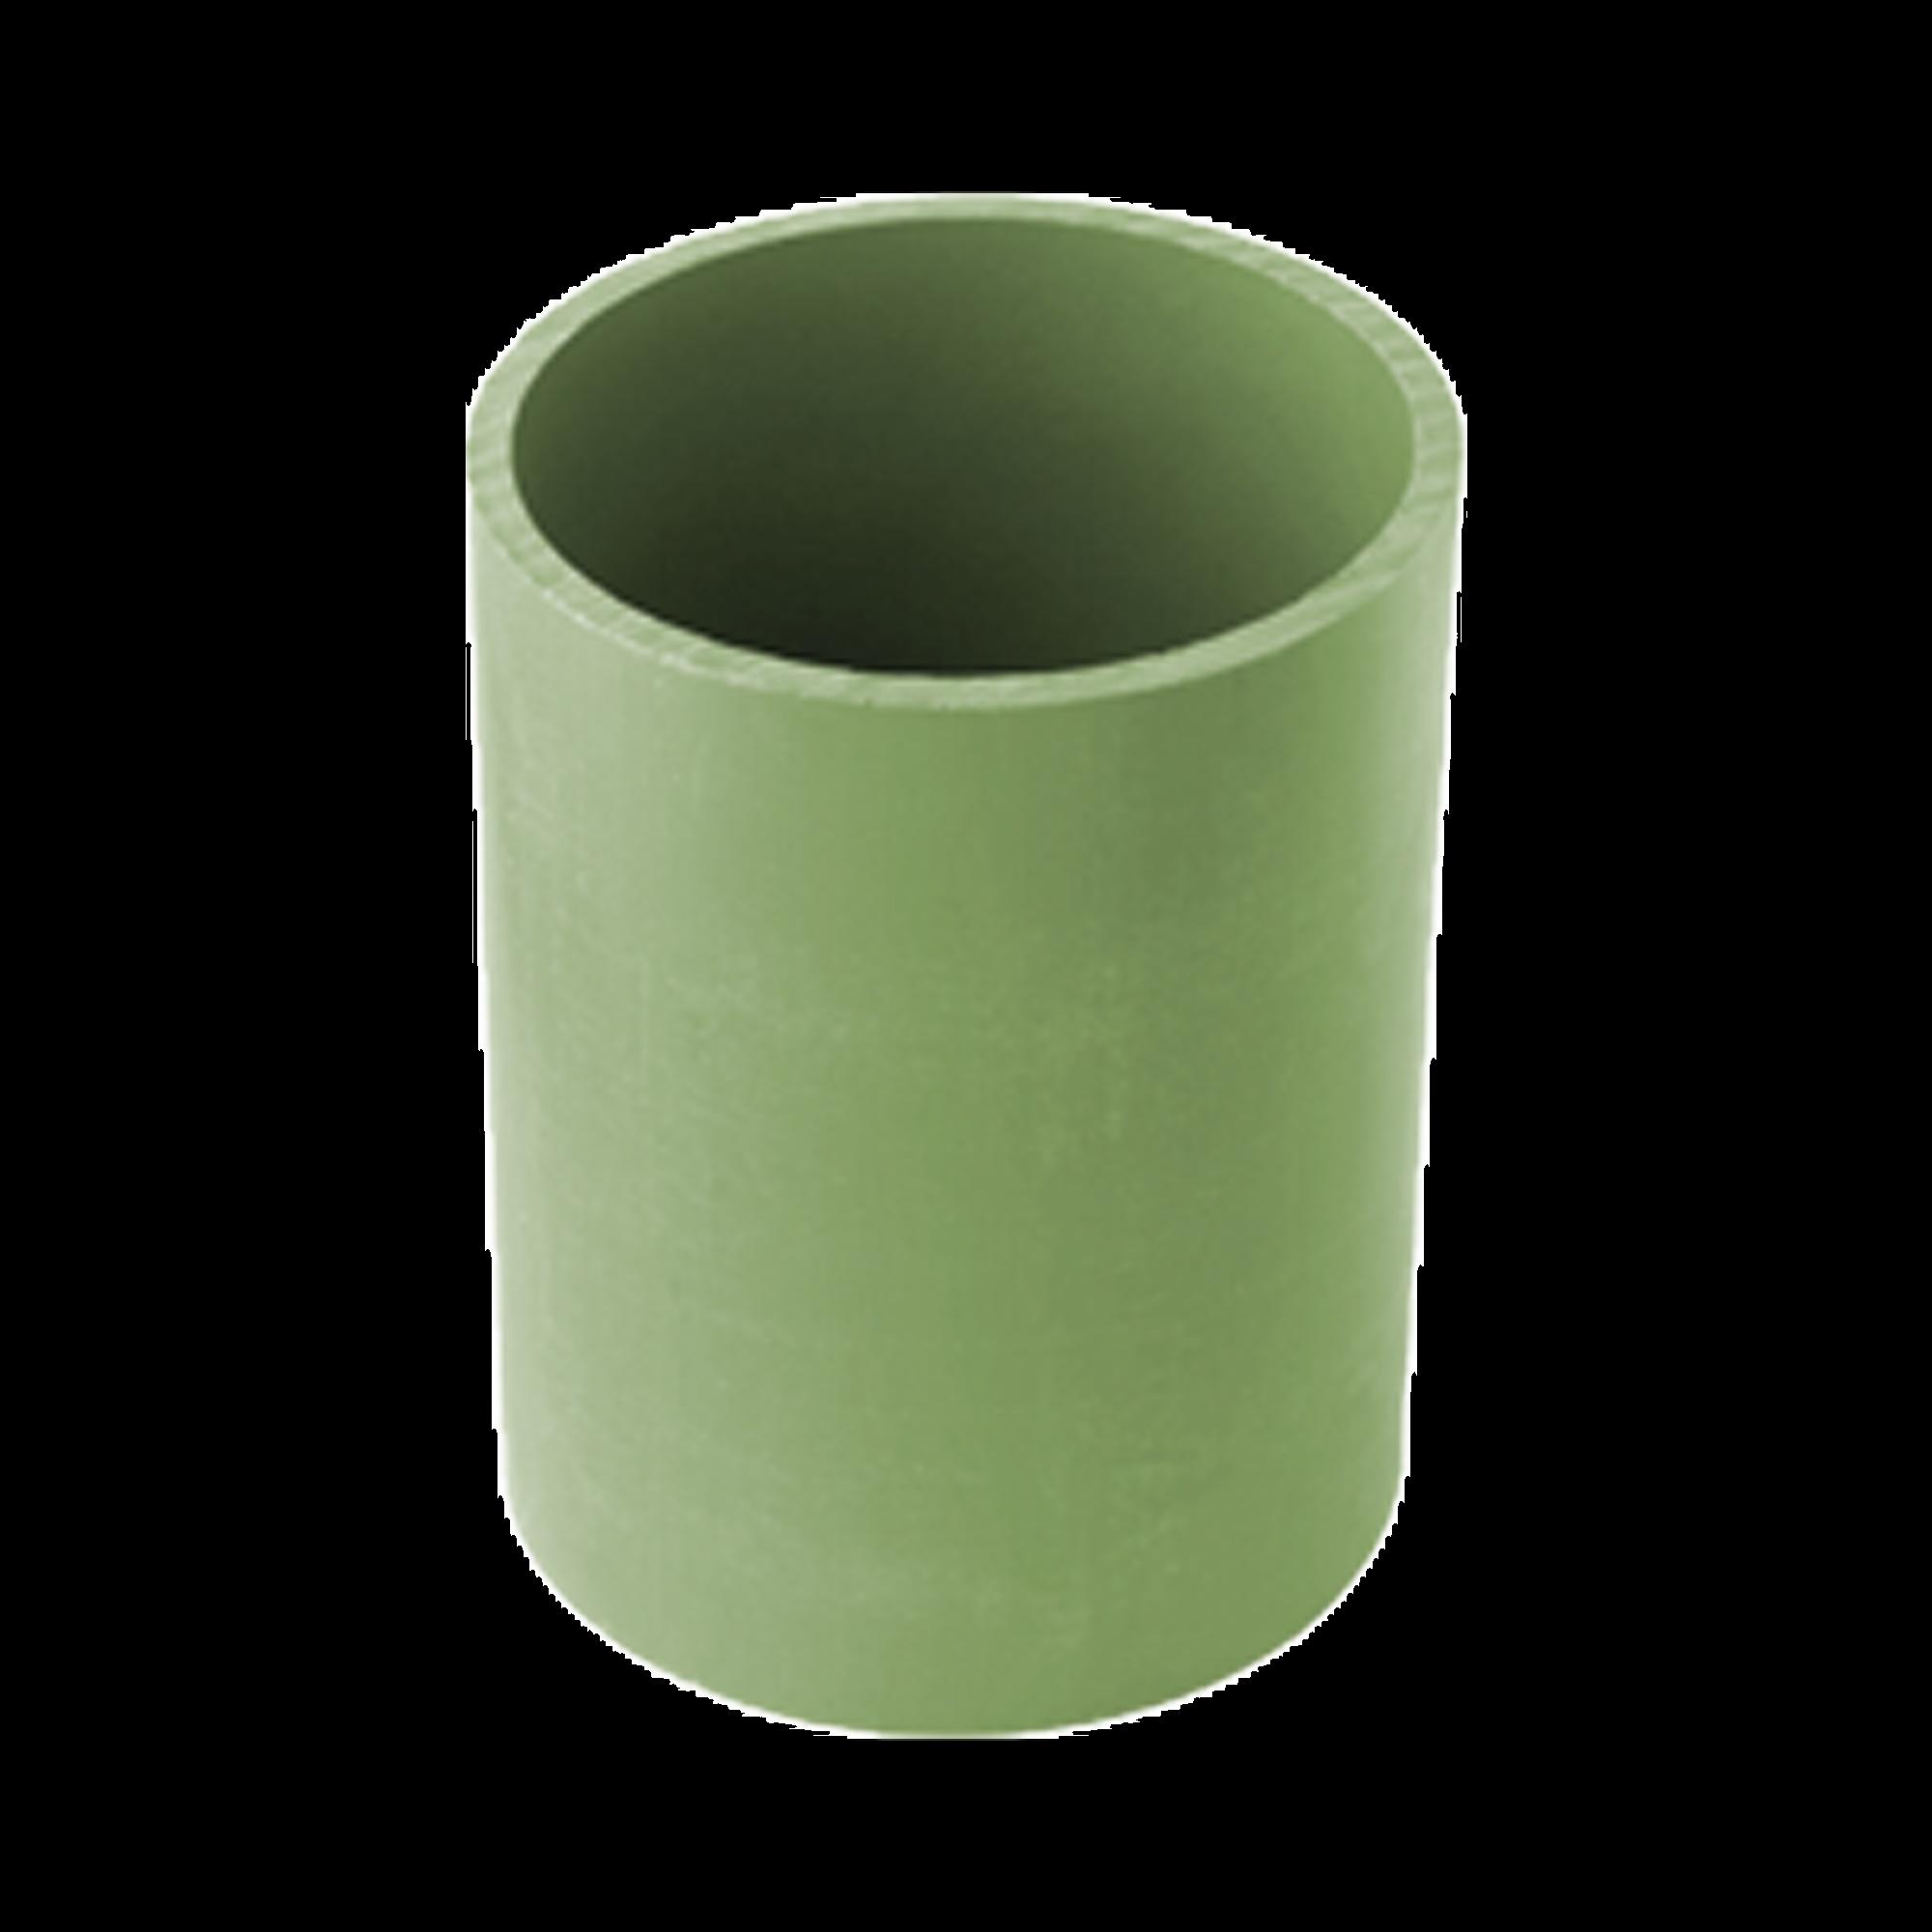 Cople para tubo PVC Conduit pesado de 3/4 (19 mm)